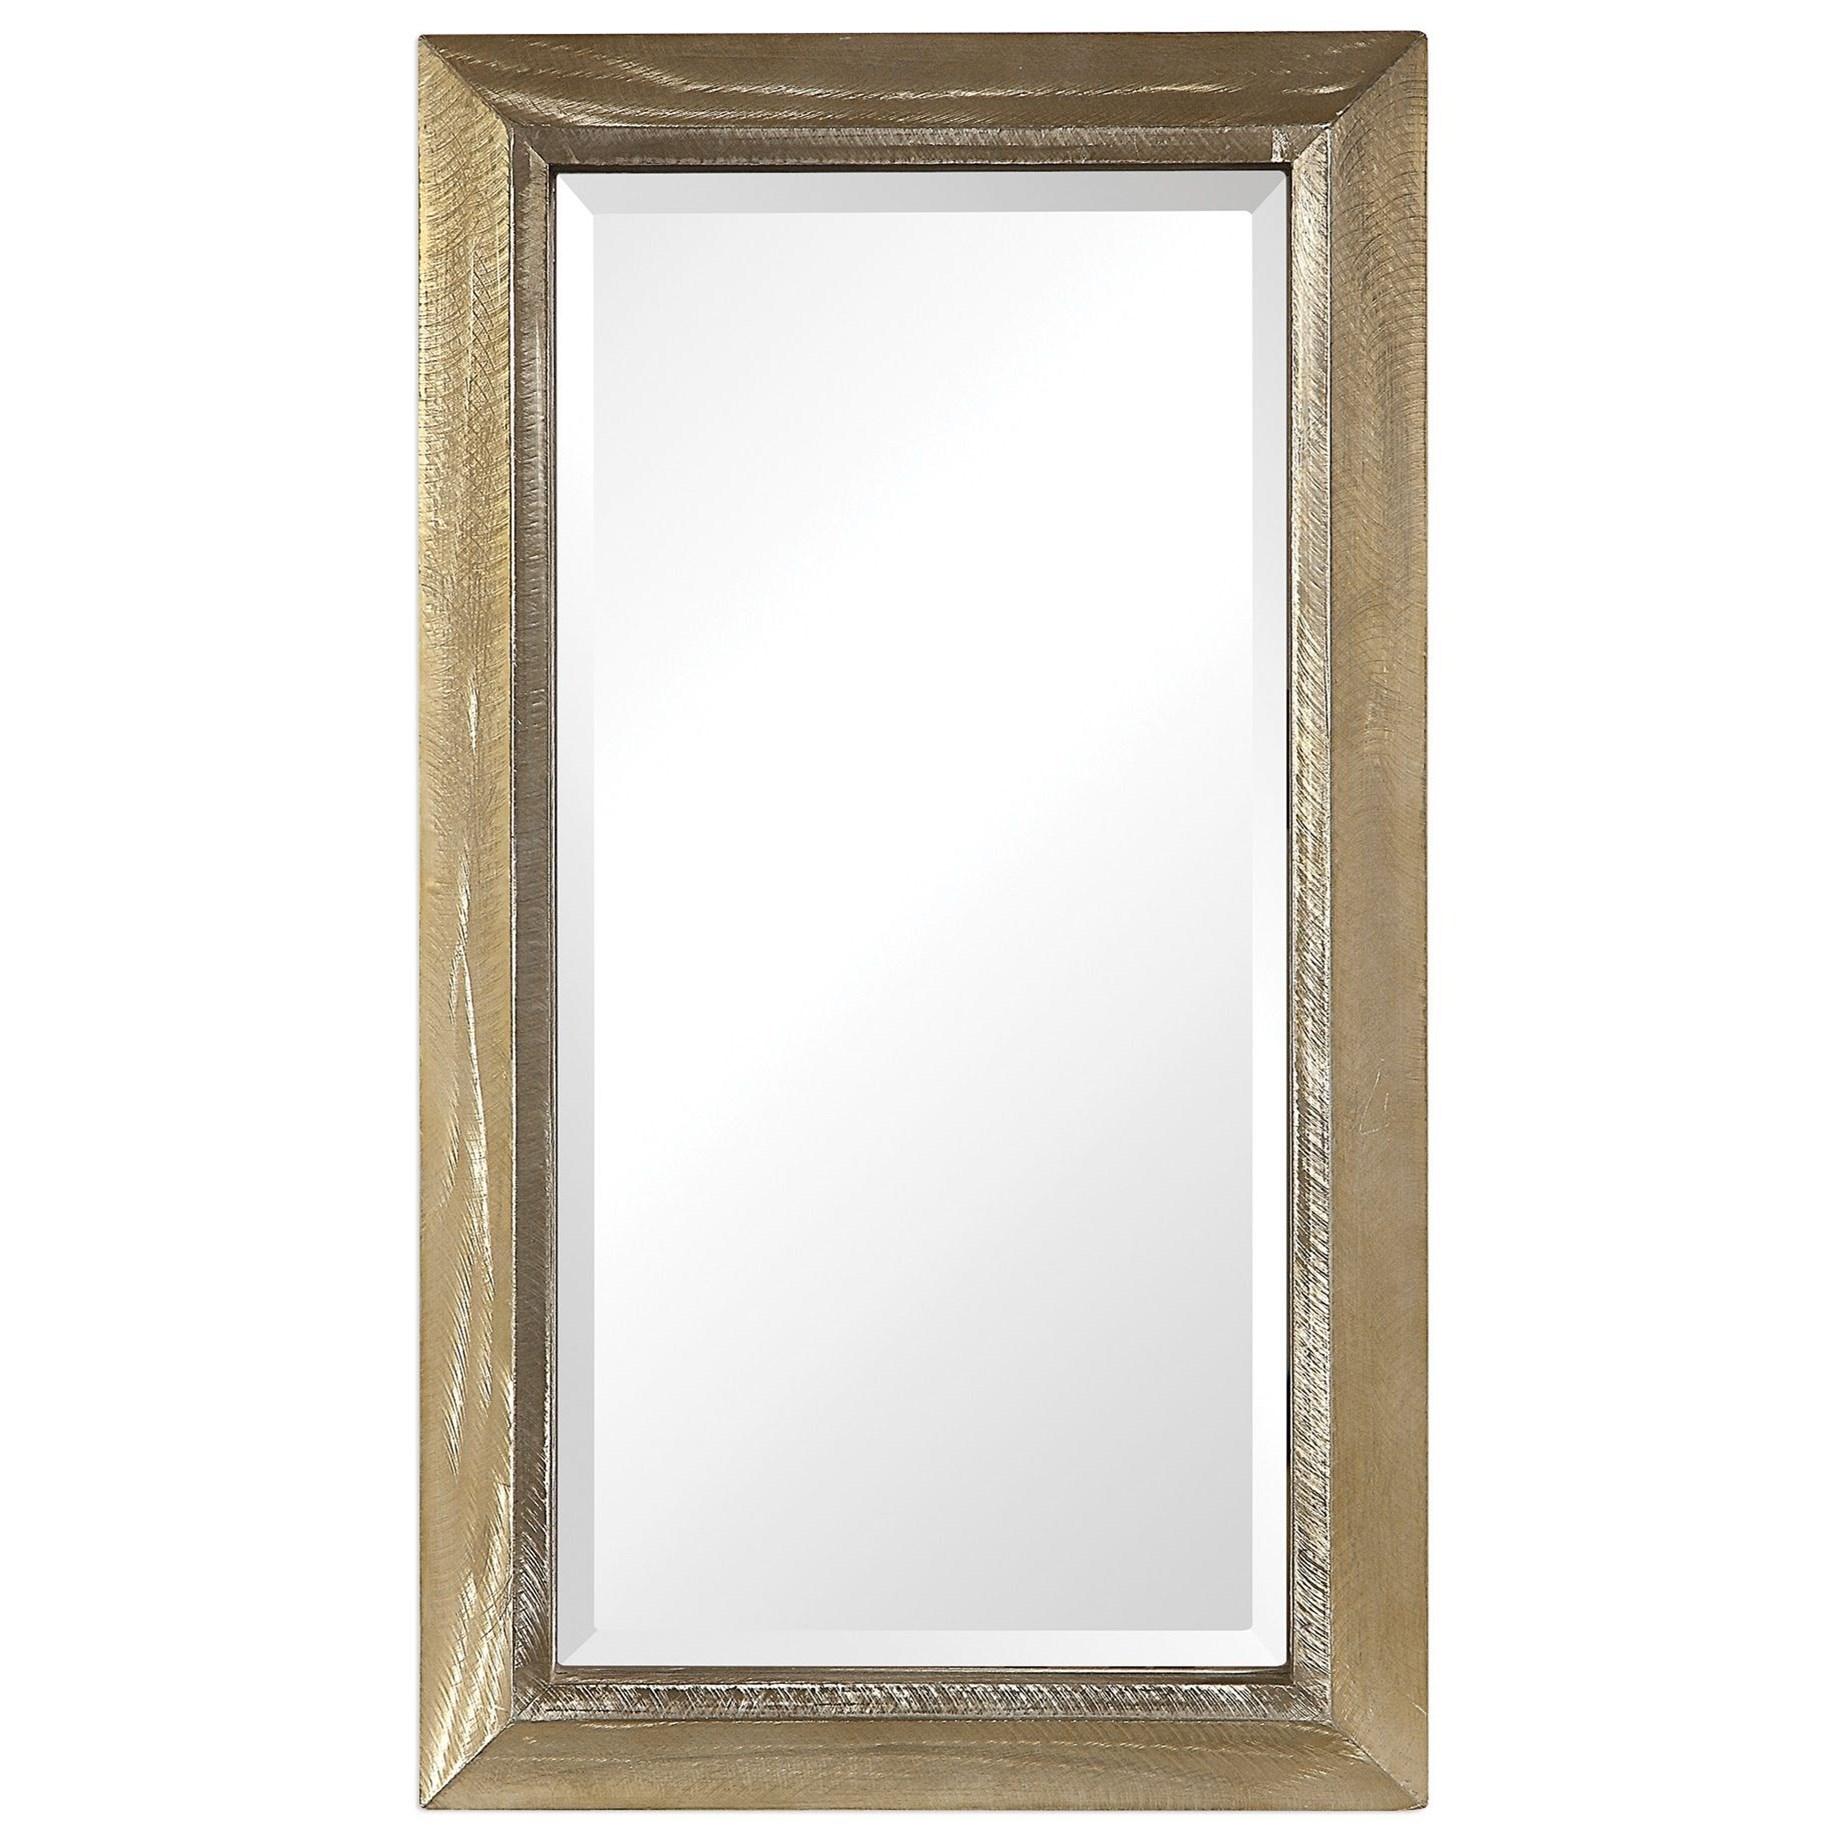 Mirrors Madock Metallic Brass Mirror by Uttermost at Wayside Furniture